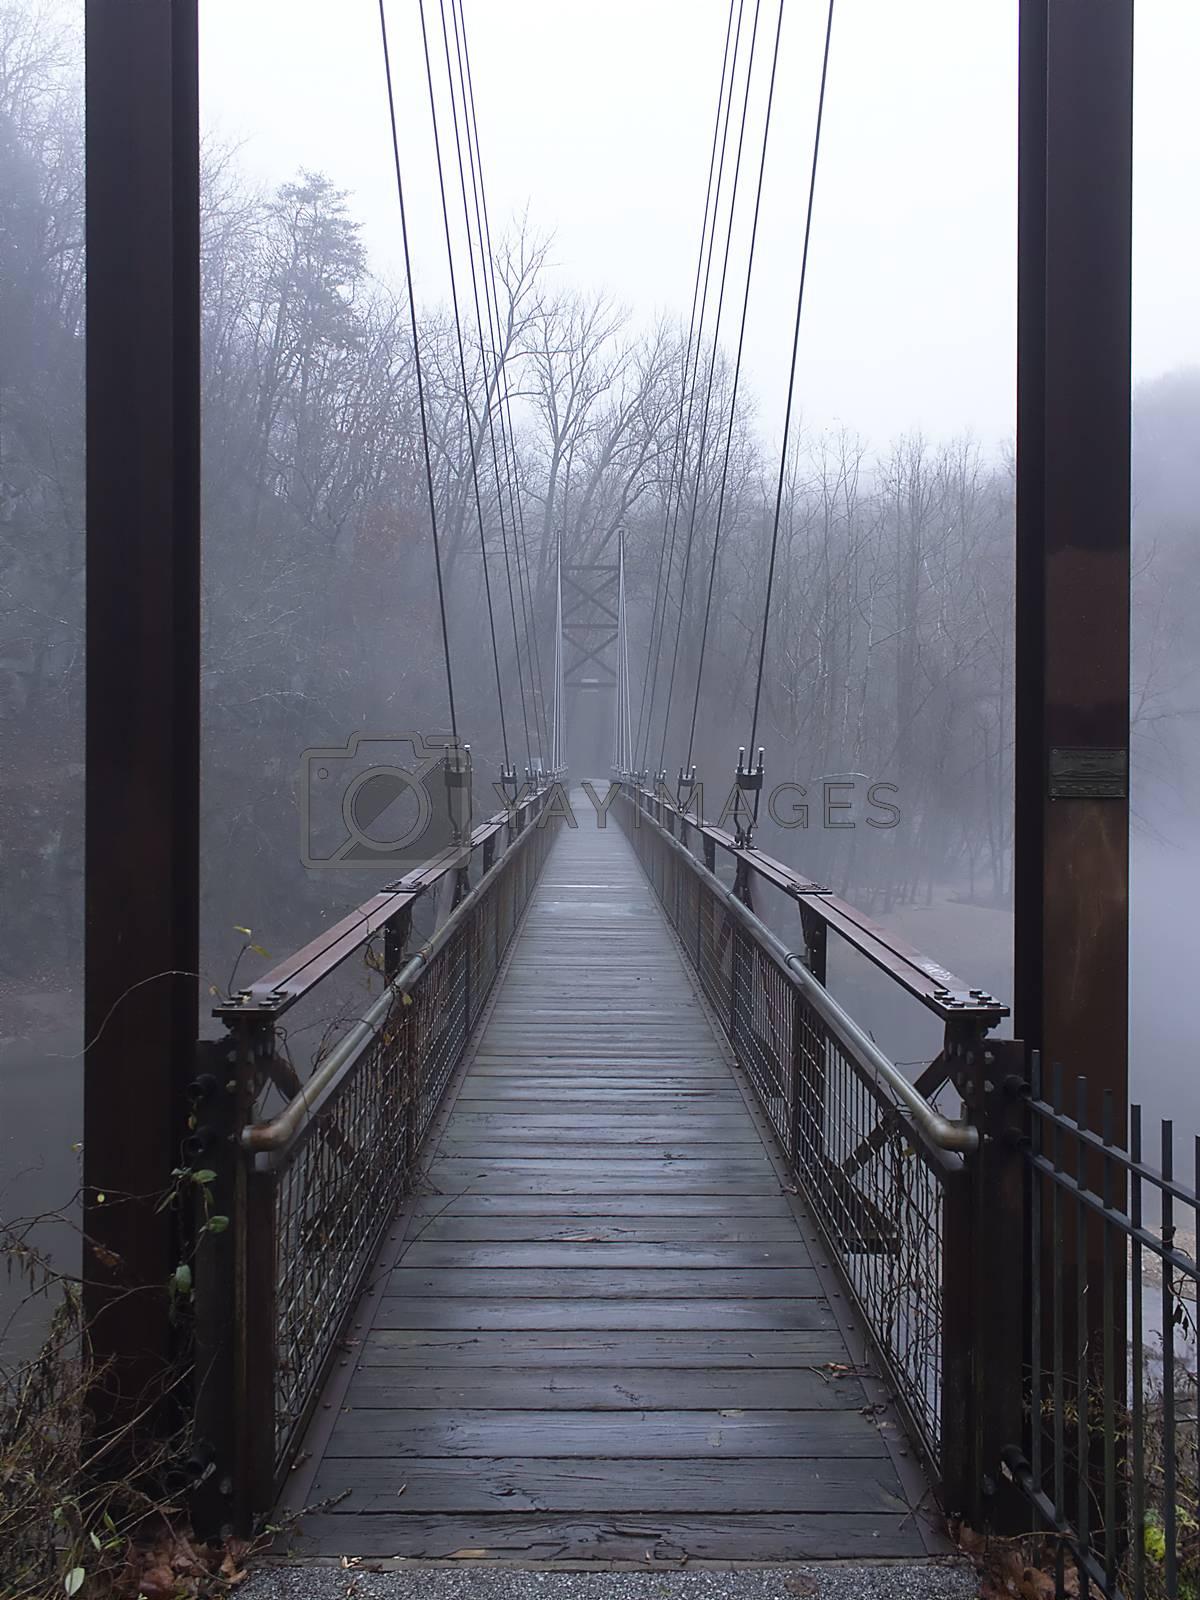 Pedestrian suspension bridge over river by Charlie Floyd